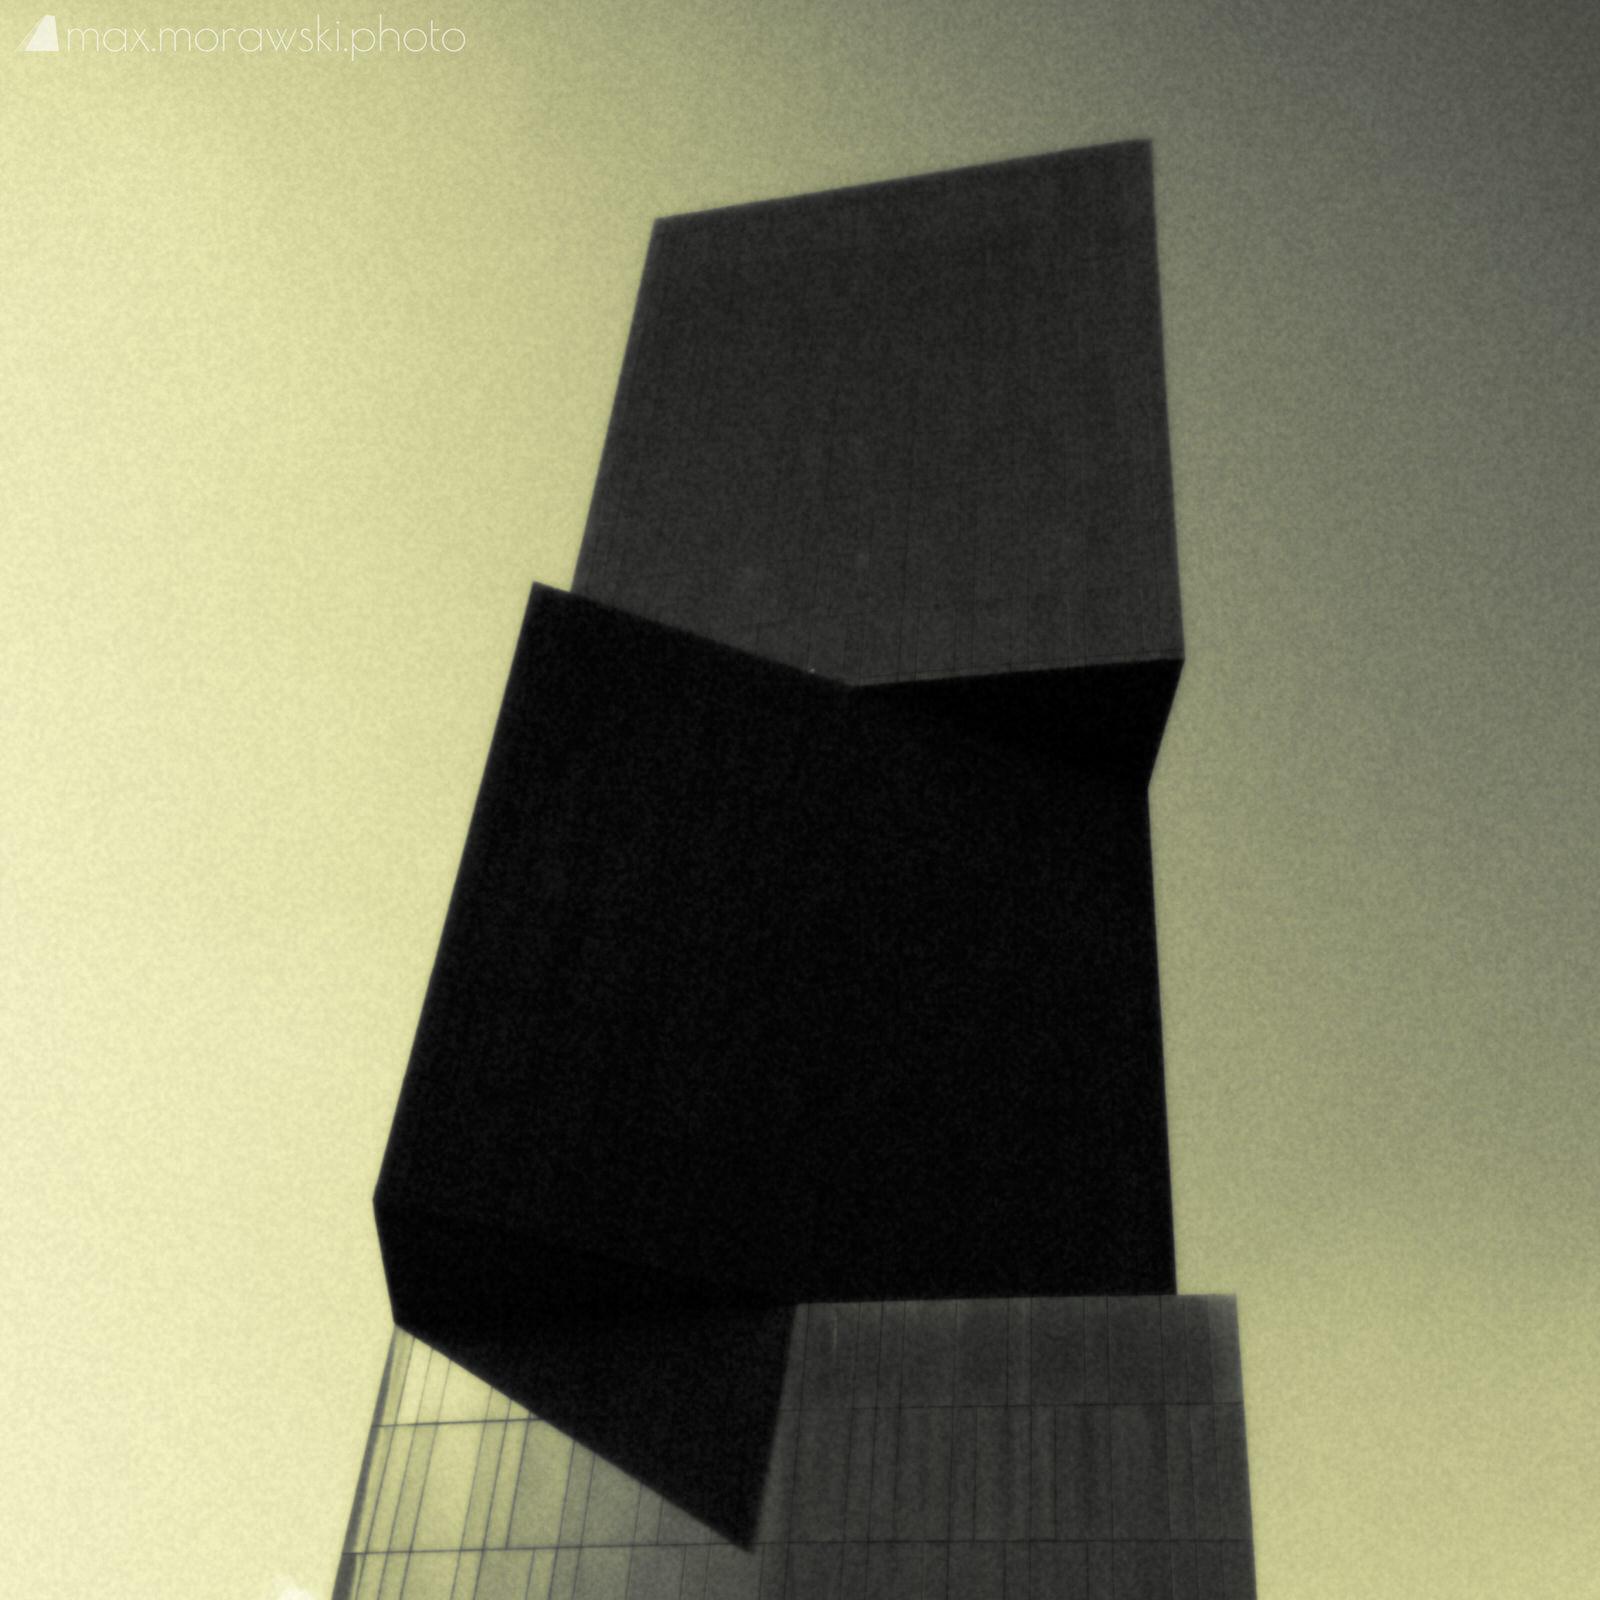 Intercontinental Transmission Tower #3 (Island of Ziy)